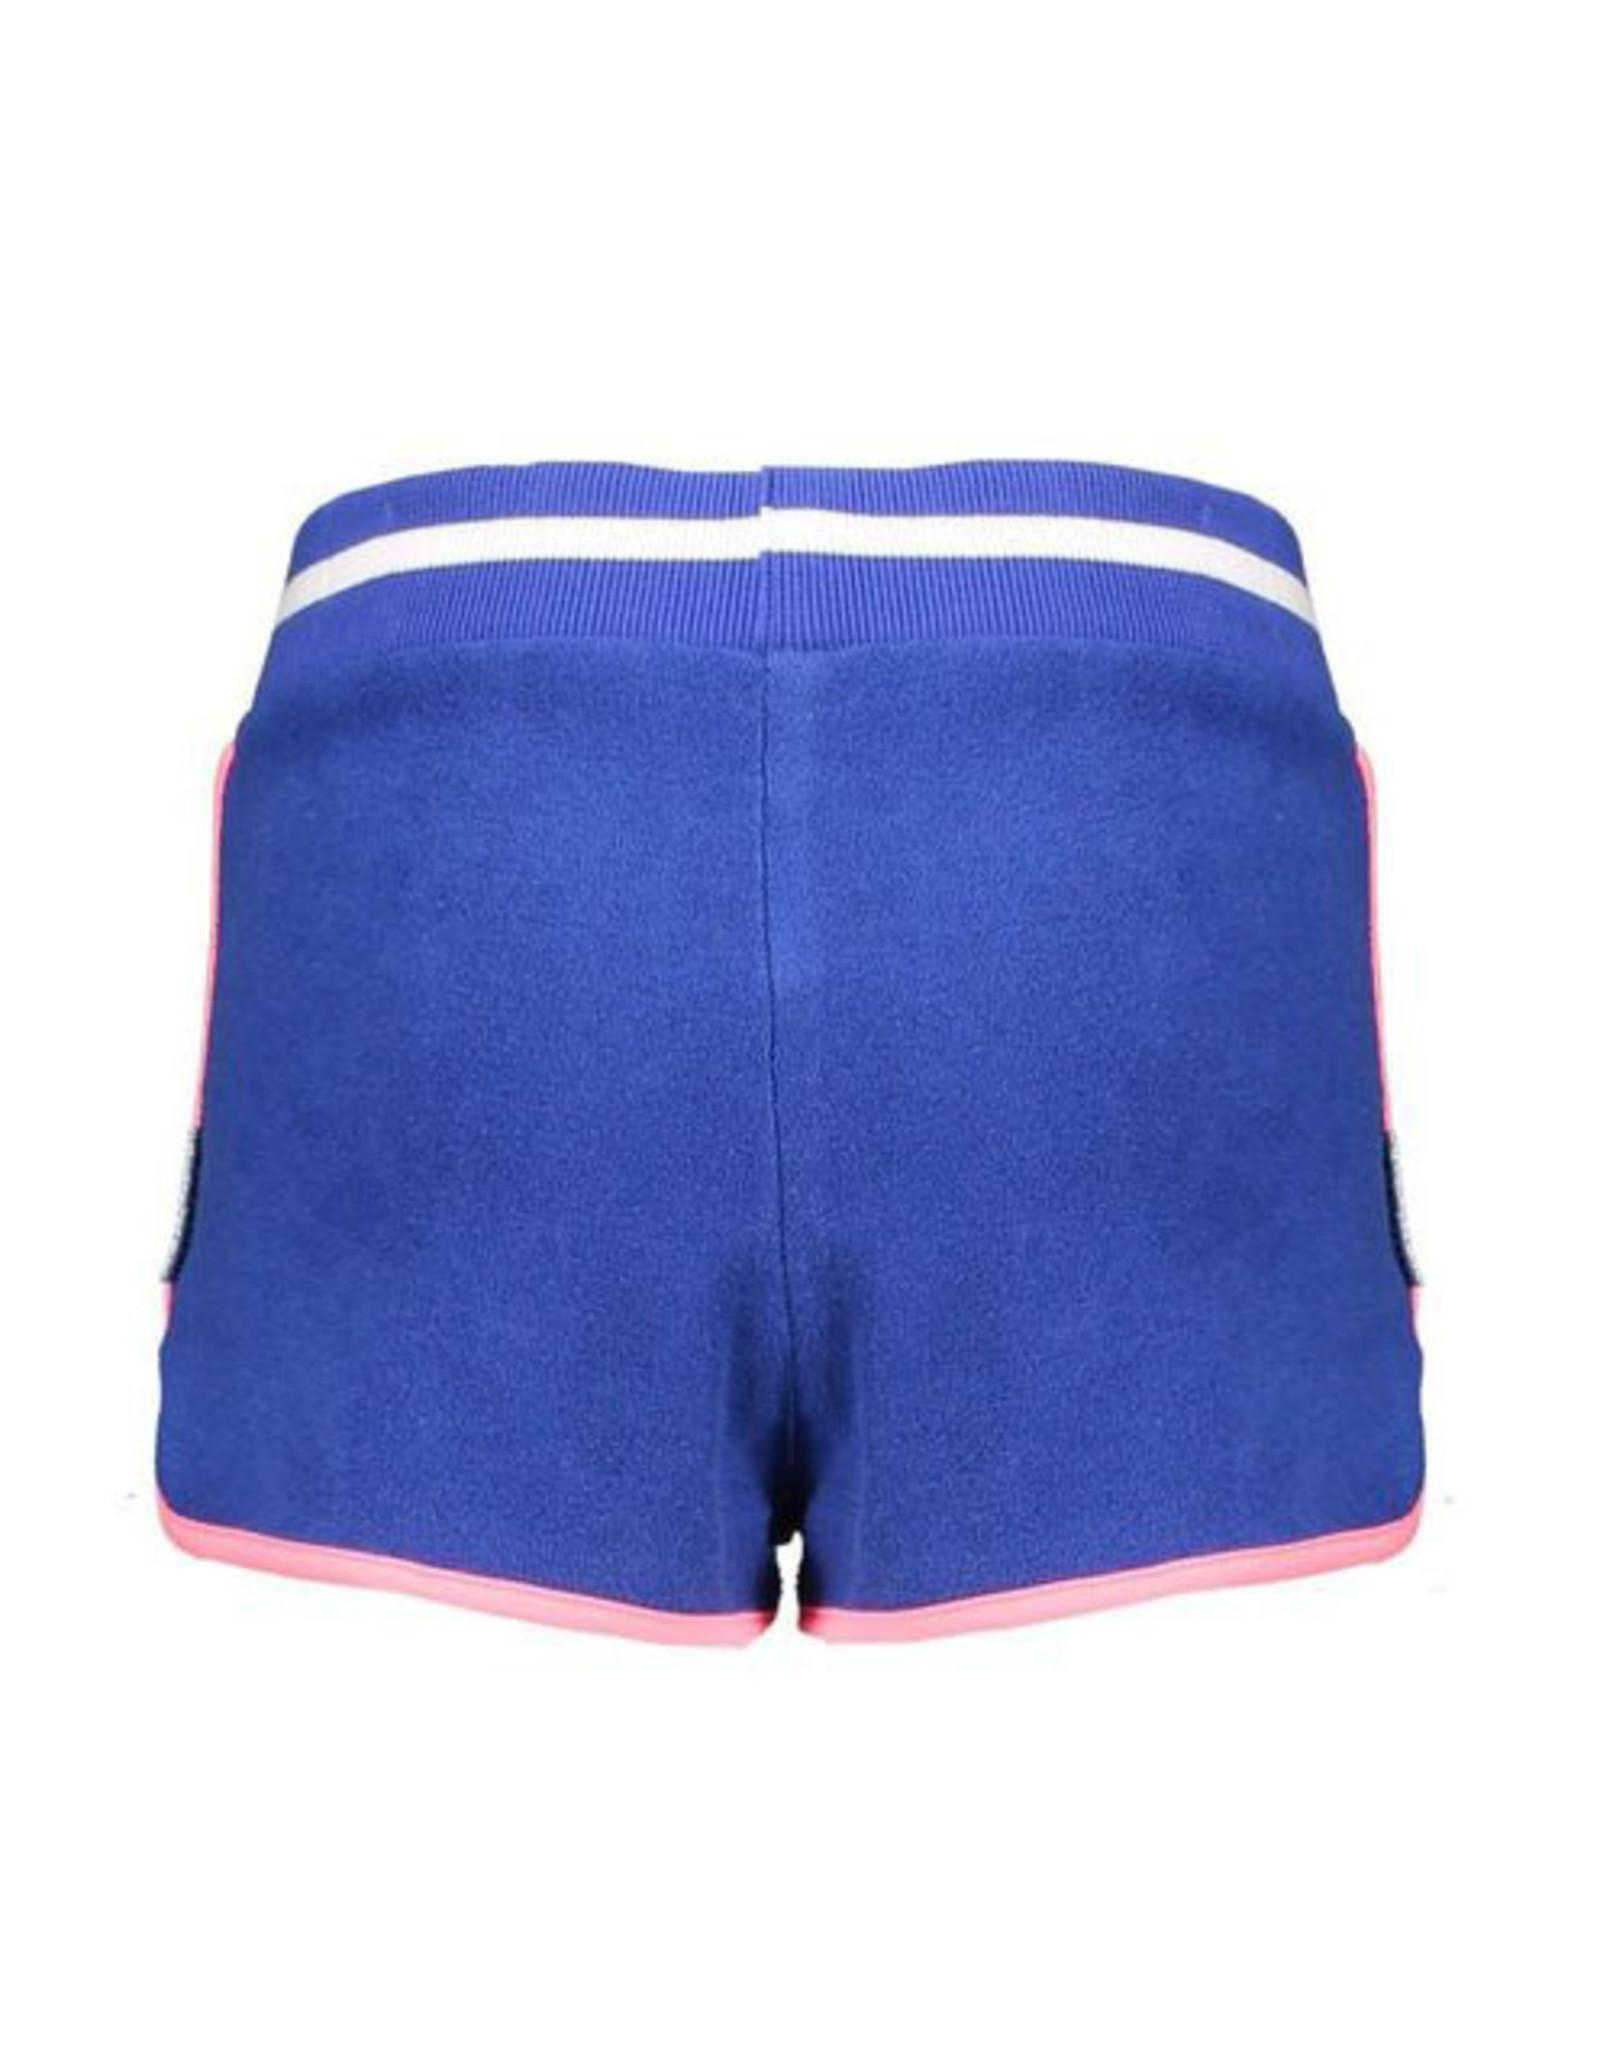 B.Nosy meisjes badstof korte broek Princess Blue